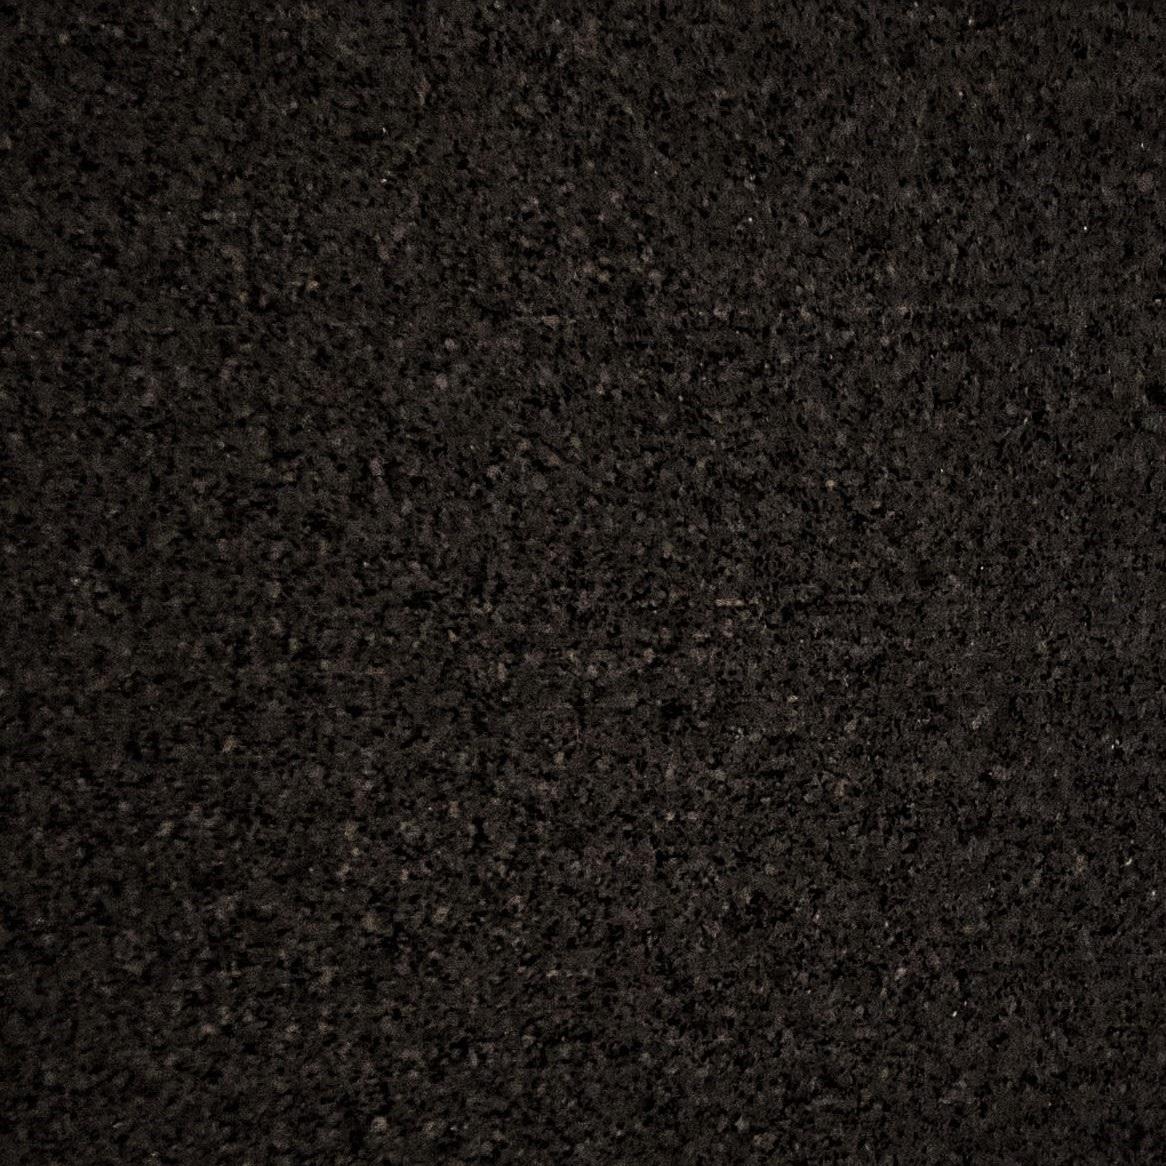 GYMlogix Rubber Flooring Tiles Solid Black